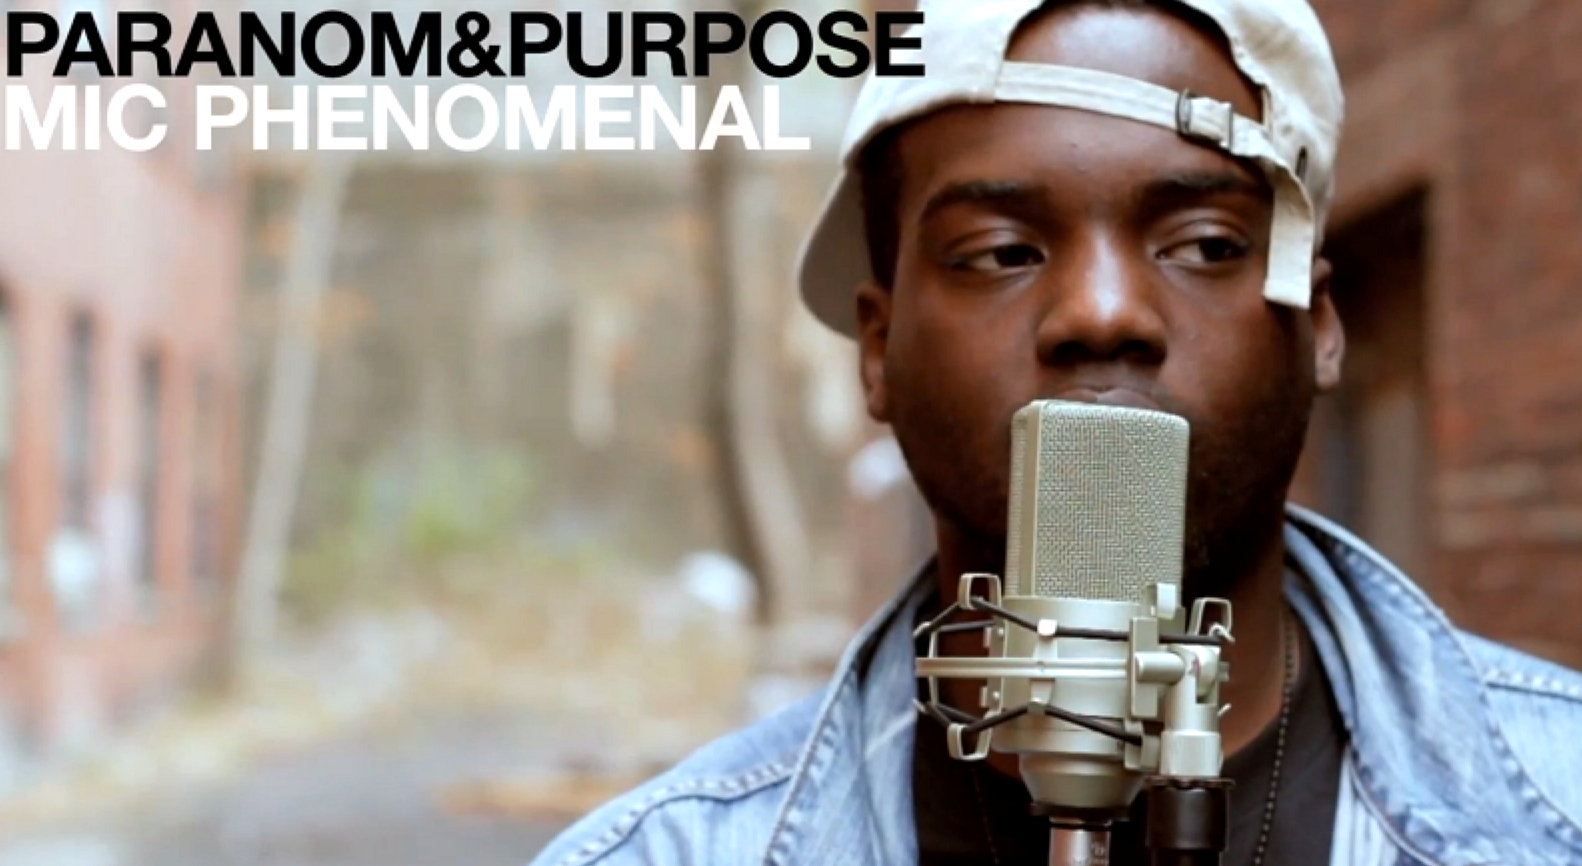 paranom purpose microphone phenomenal le clip freshnewsbysteph. Black Bedroom Furniture Sets. Home Design Ideas